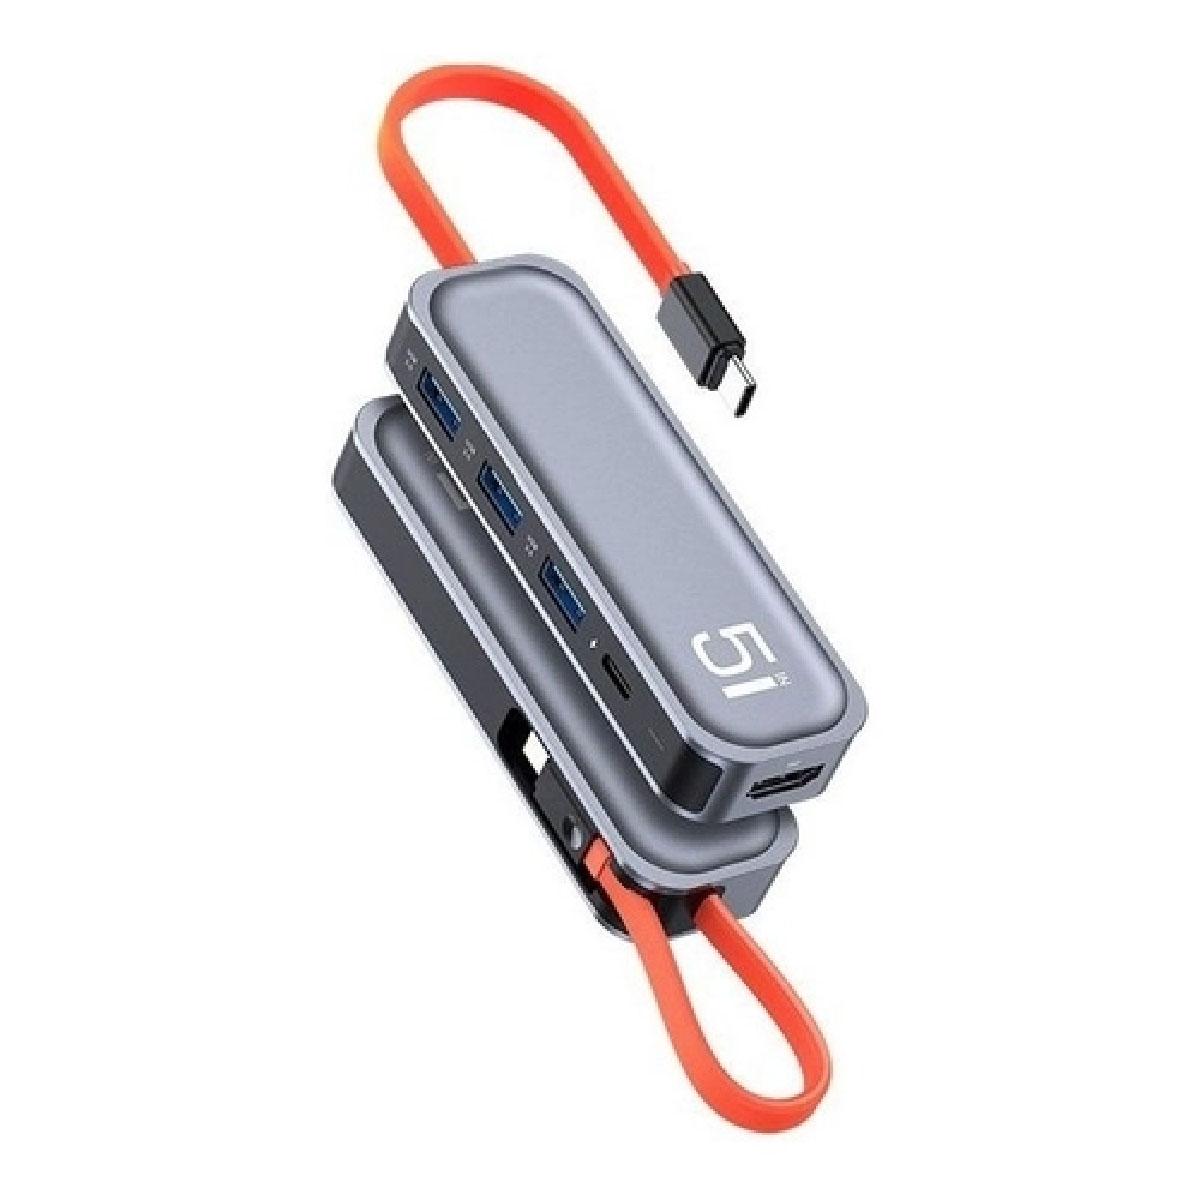 Hub 5 em 1 USB Tipo-C p/ 3x USB 3.0 + PD + HDMI da ROCK Carregamento Rápido